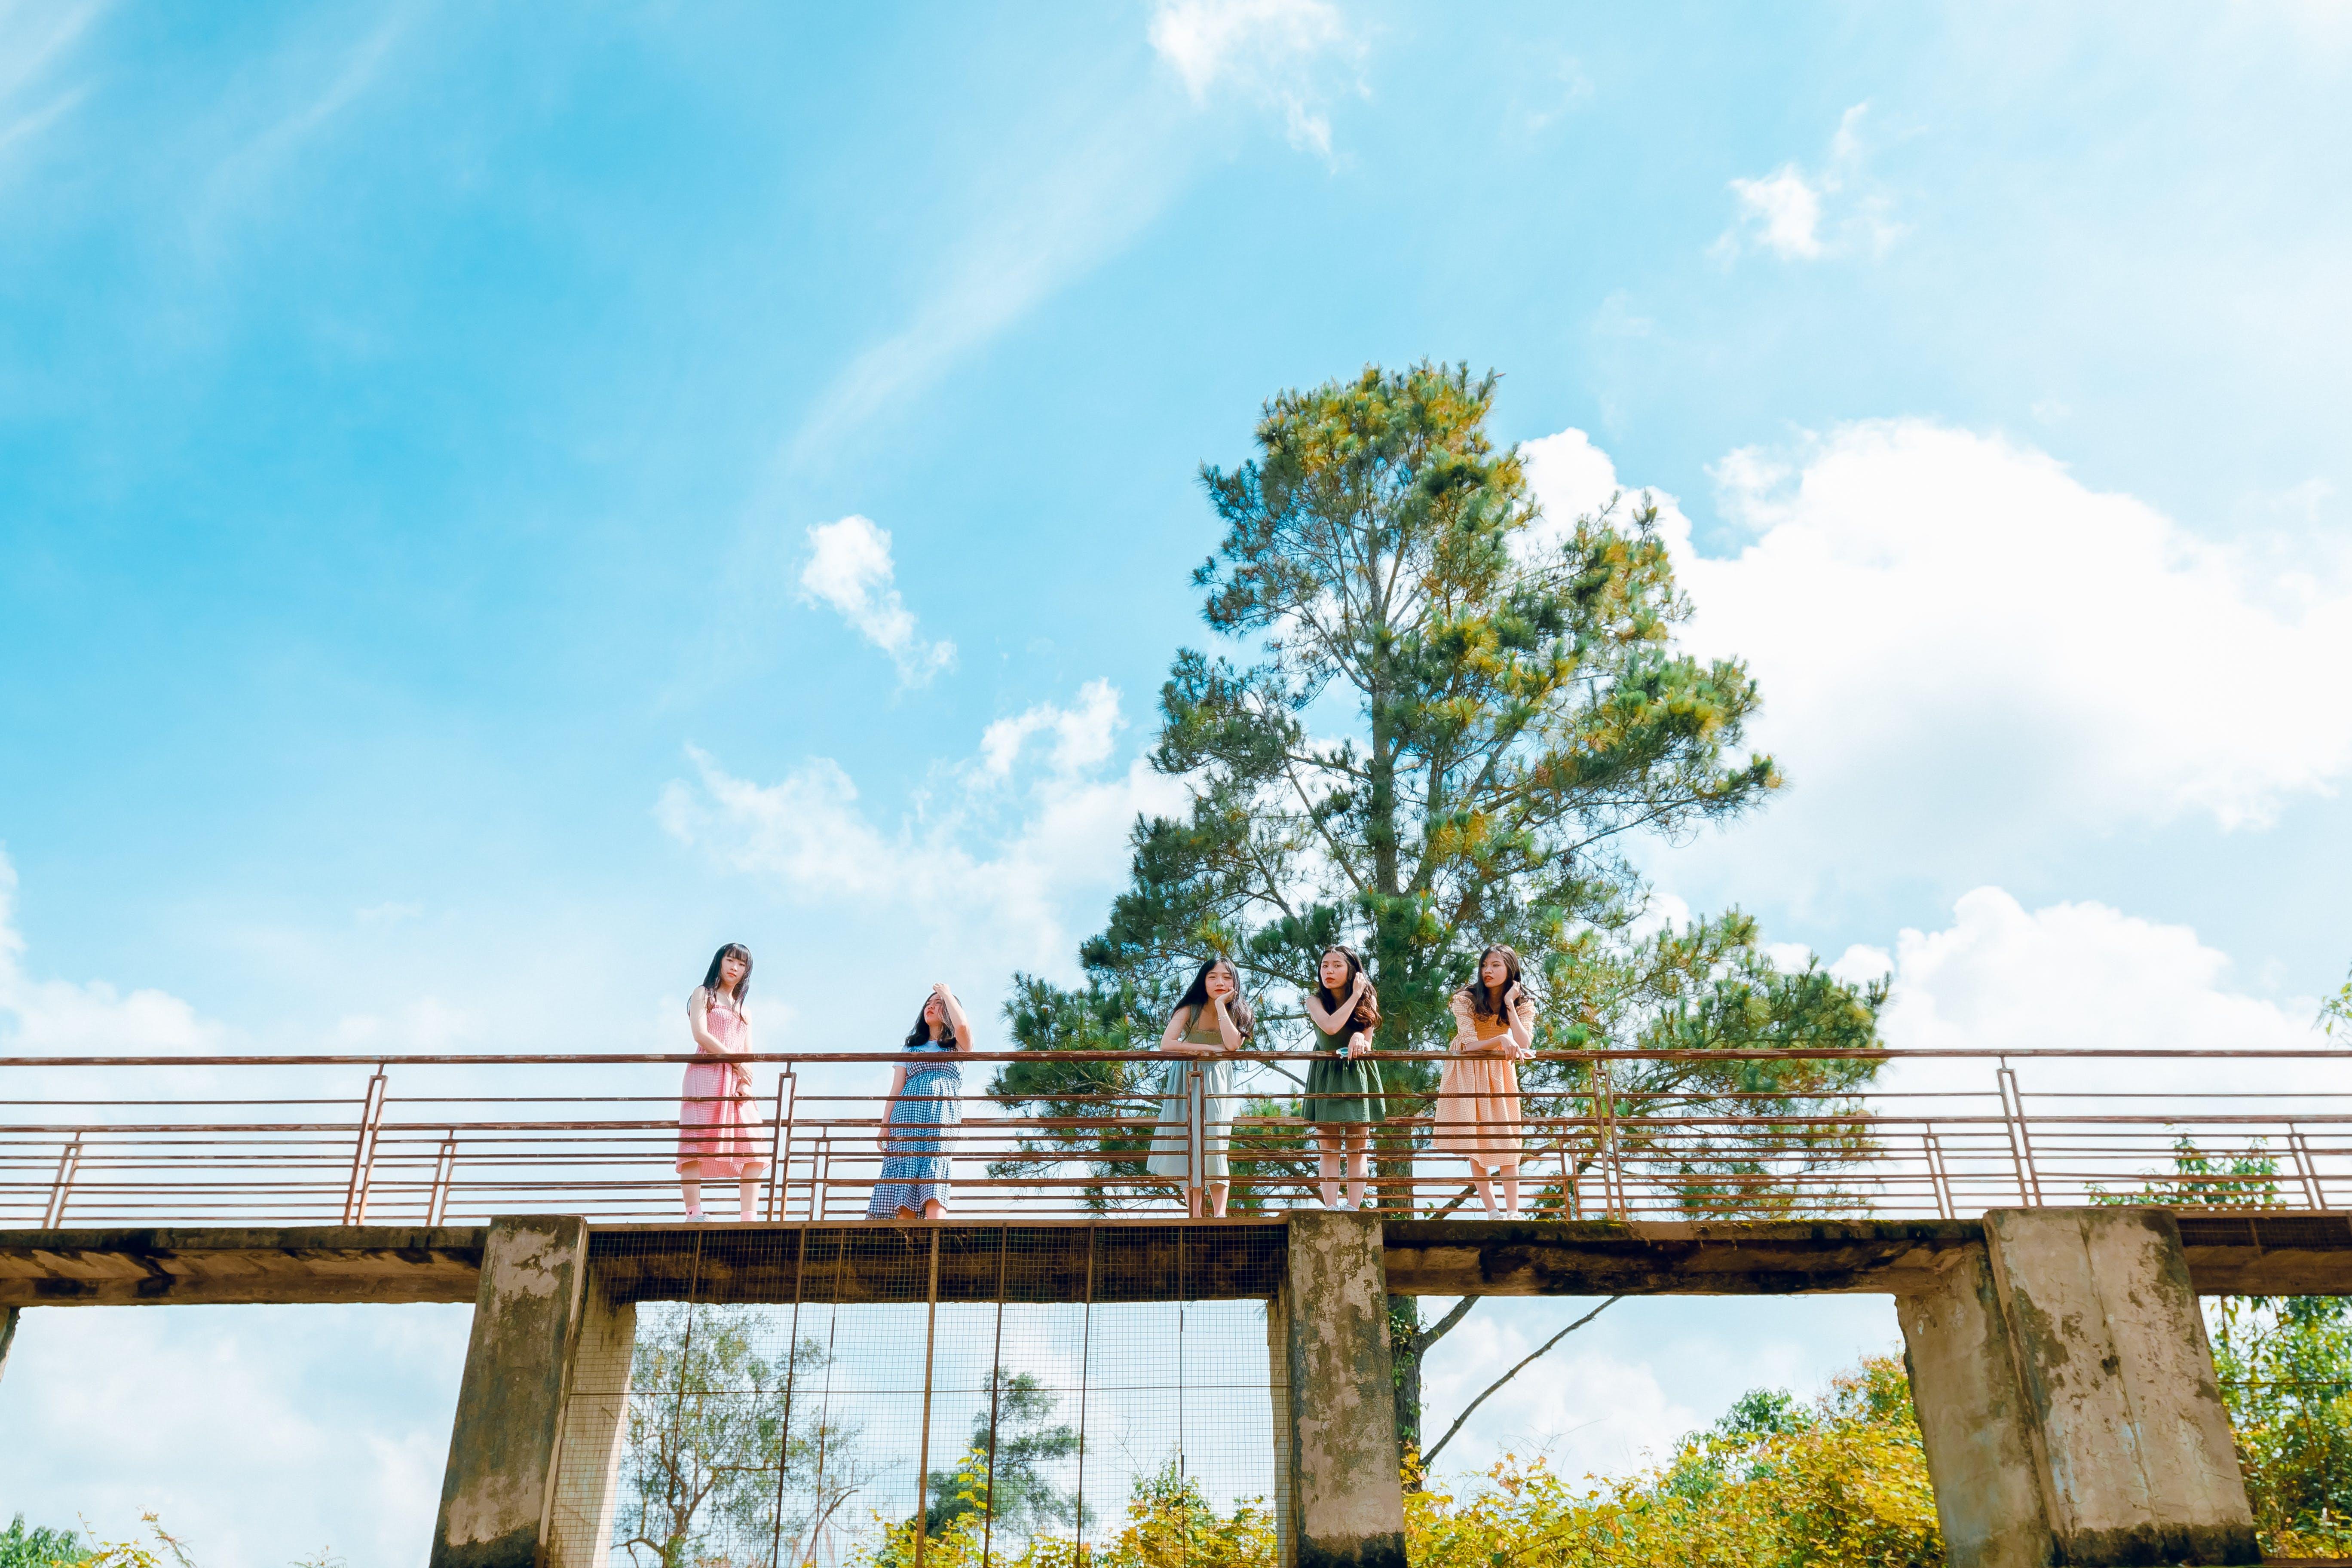 Landscape Photography of People on Bridge